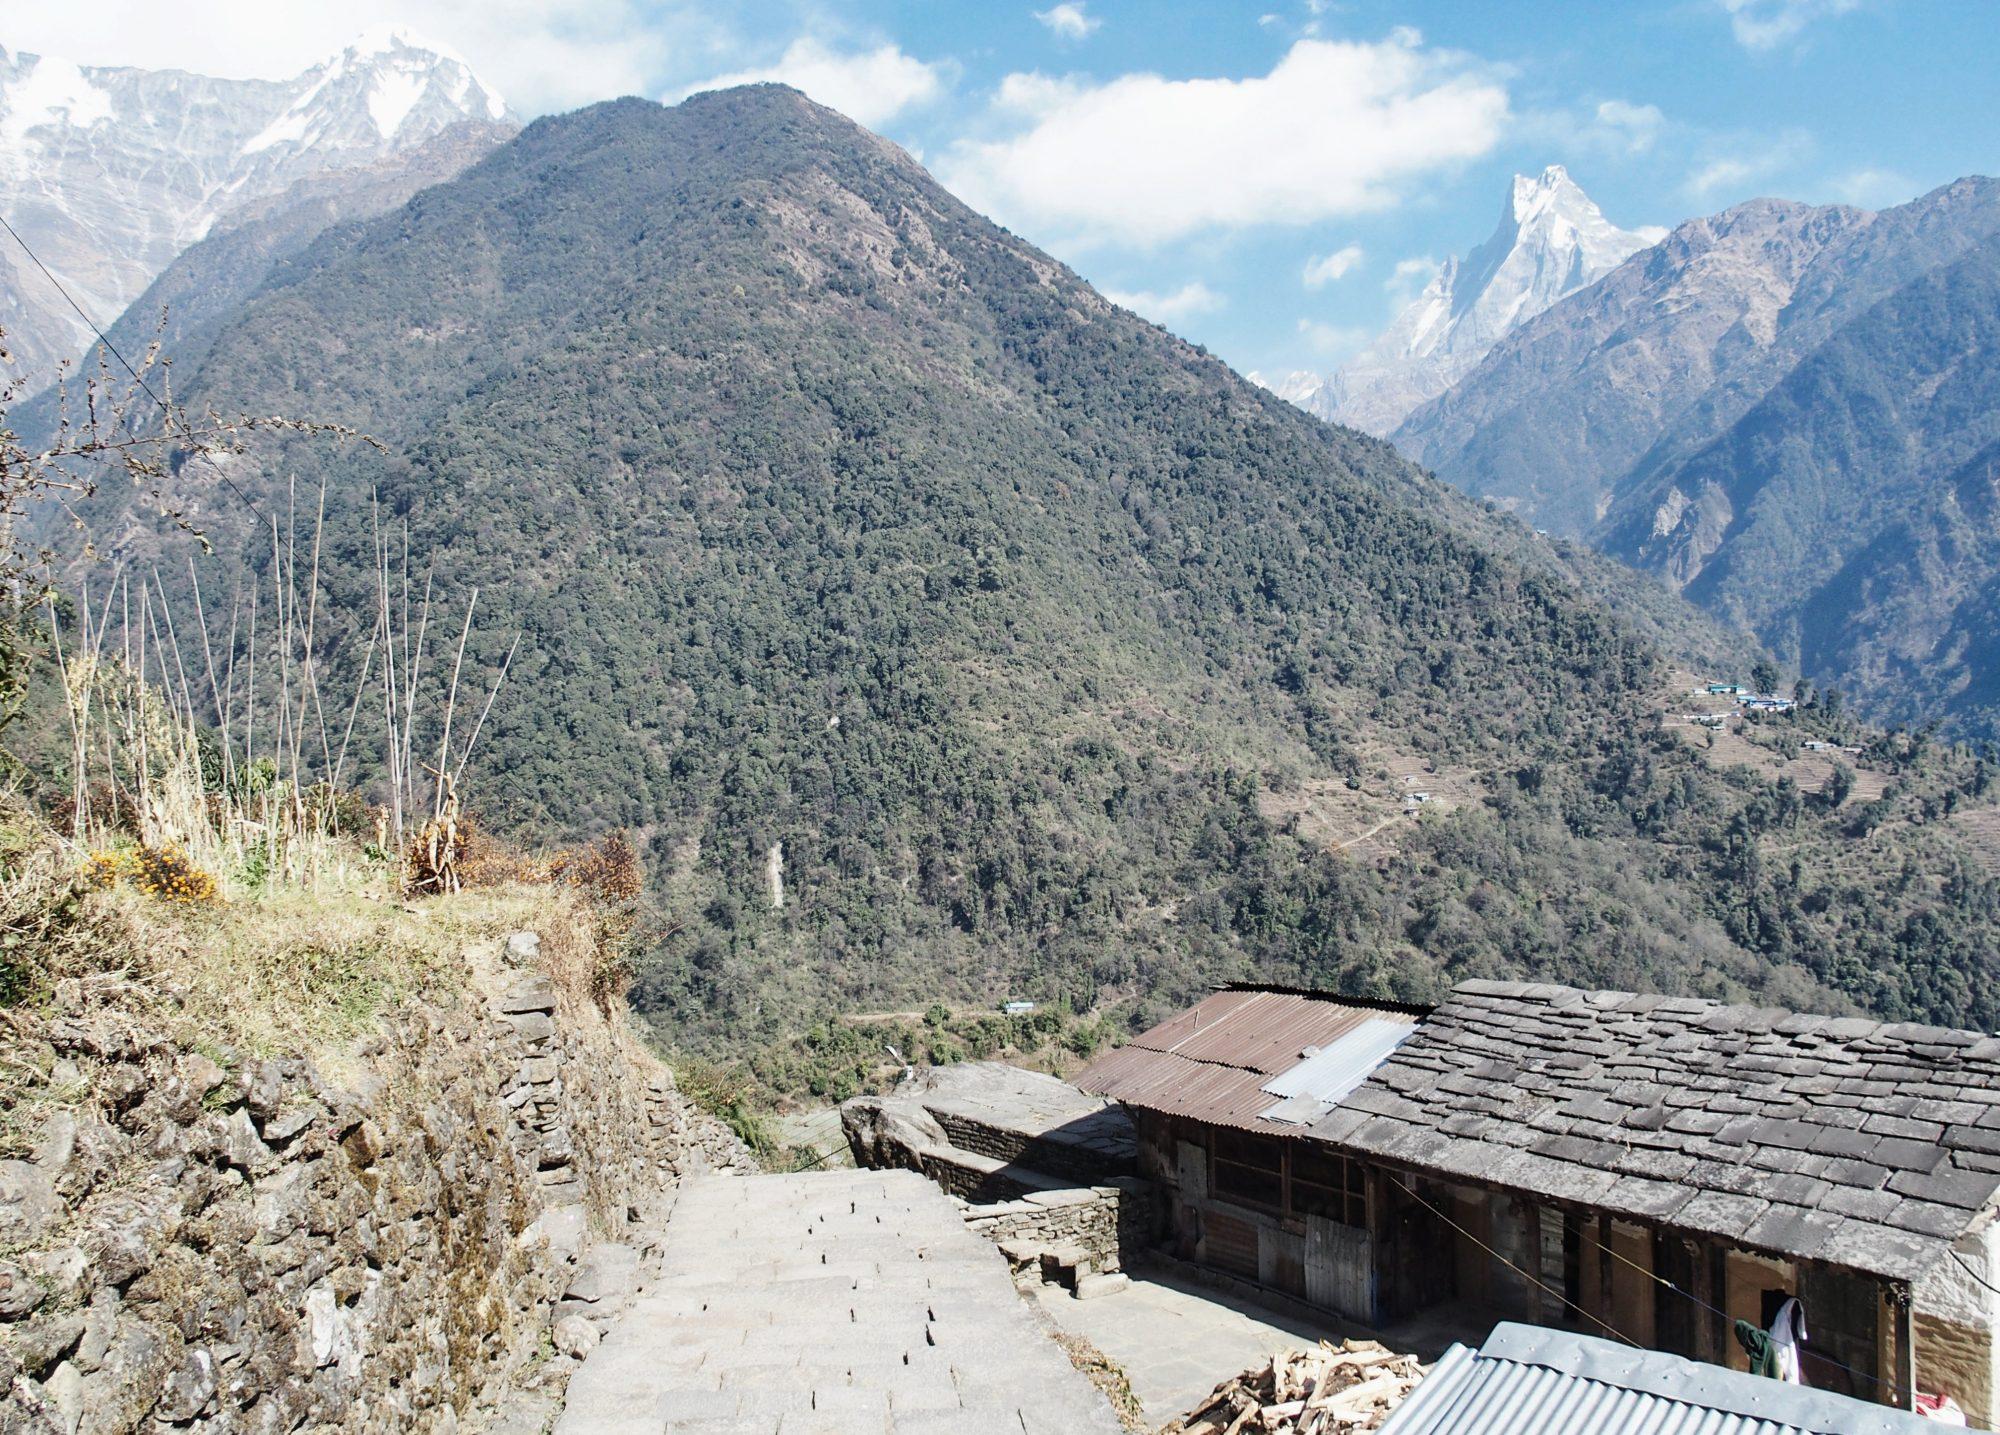 Am oberen Ende von Chomrong. Annapurna Base Camp